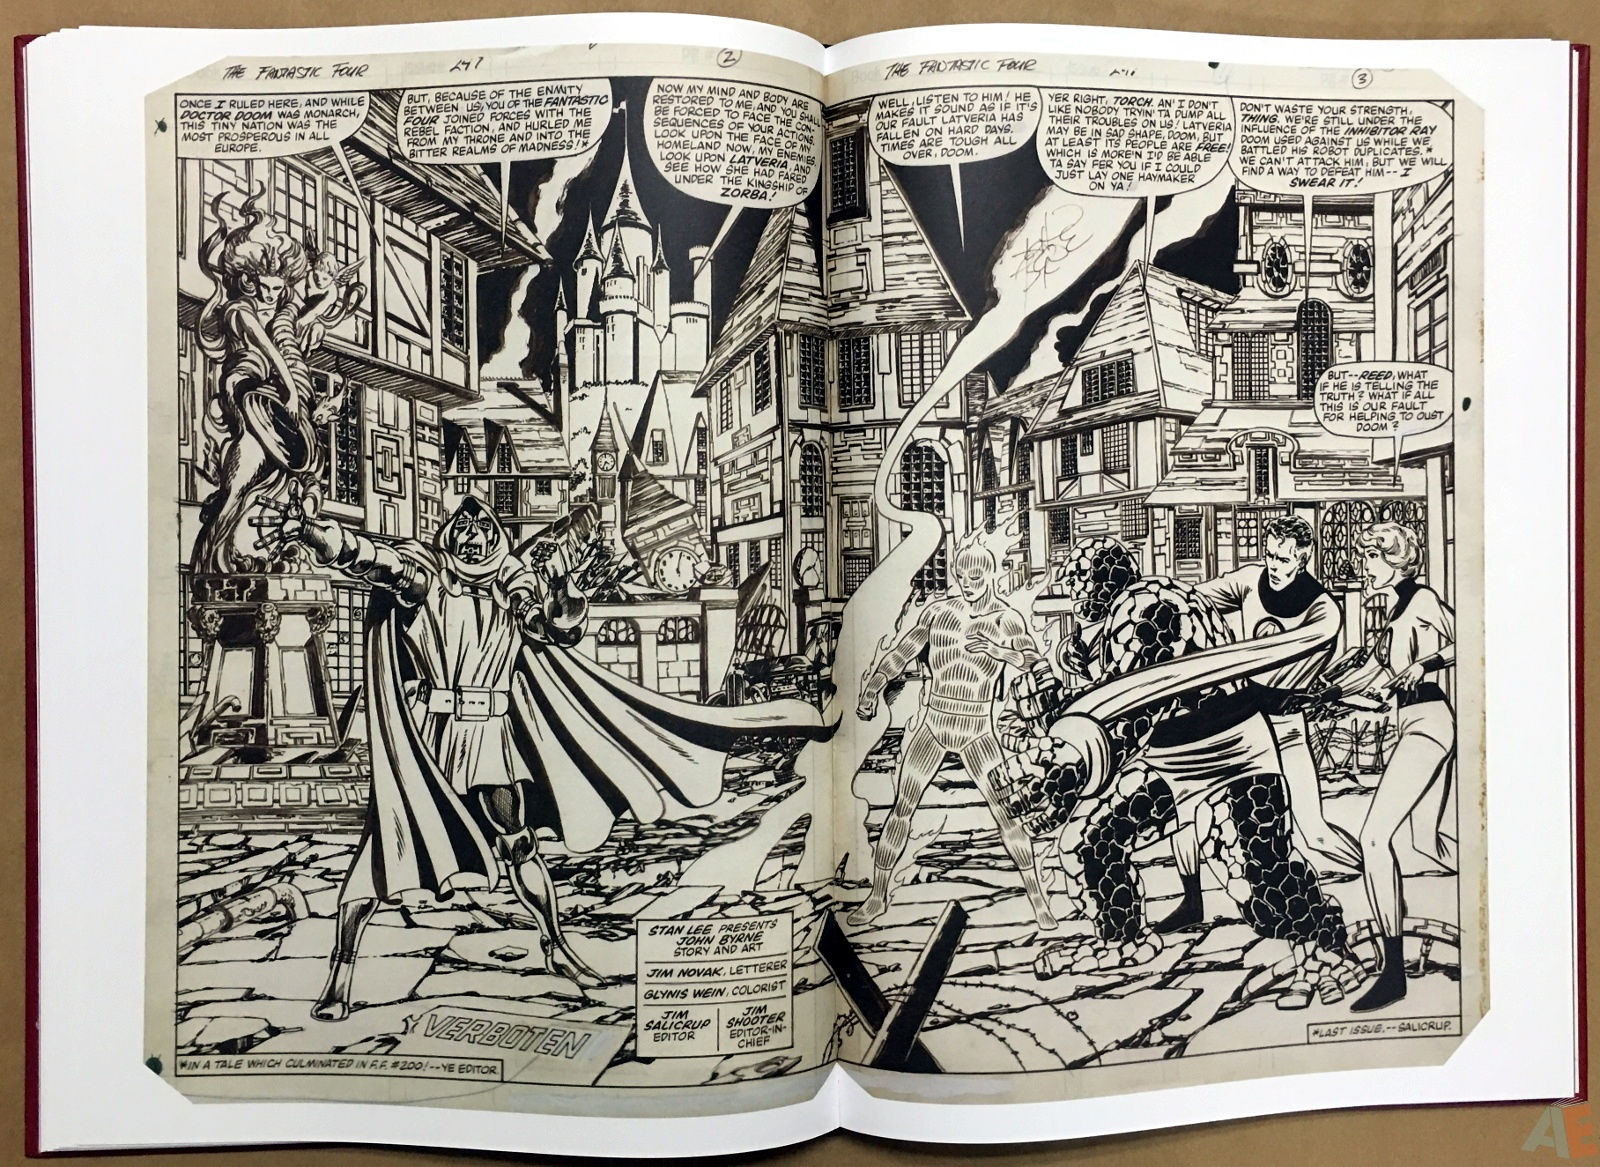 John Byrne's The Fantastic Four Artist's Edition 32